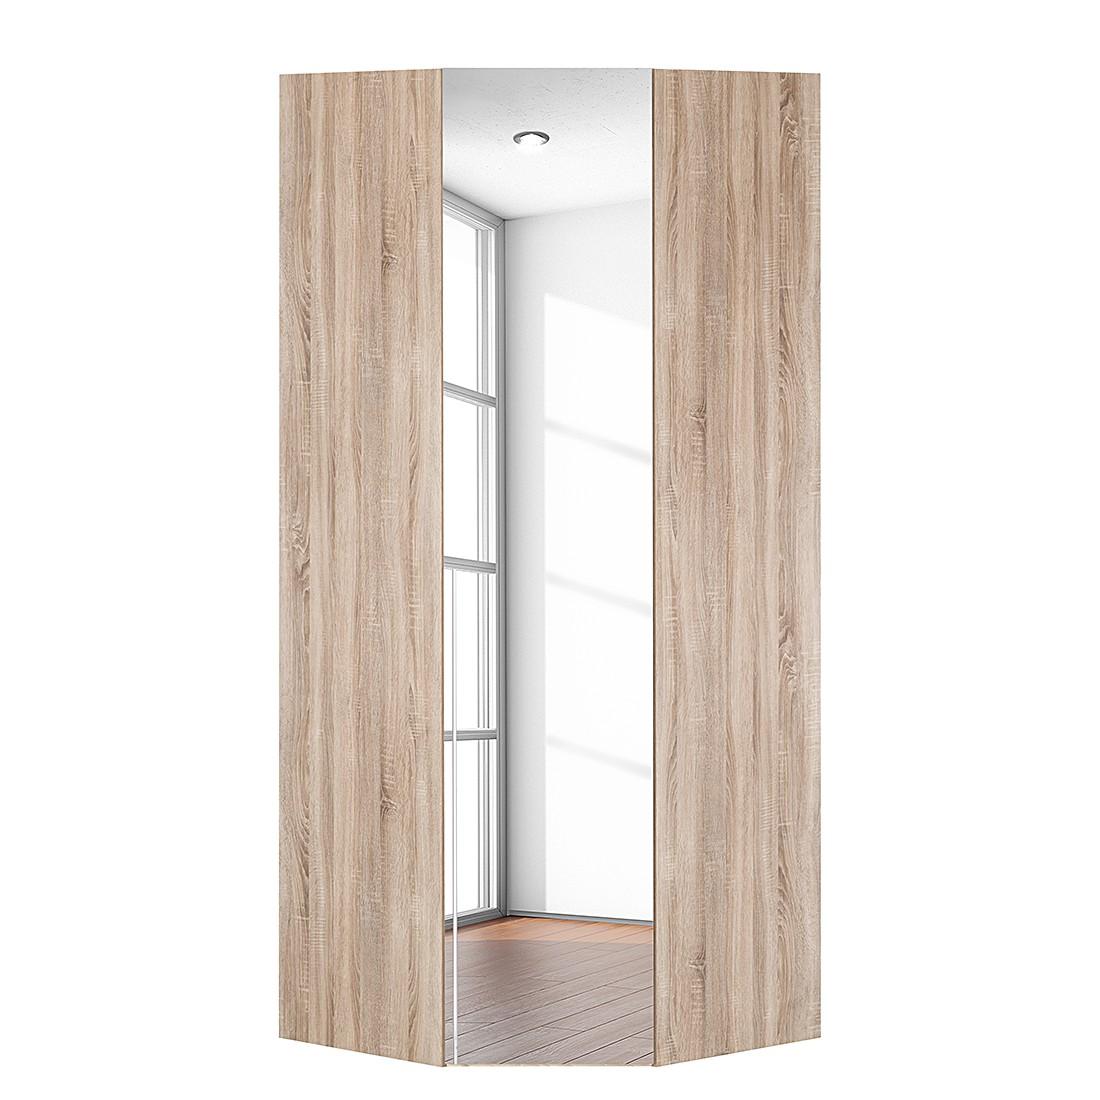 Armoire d'angle Brooklyn IV - Imitation chêne de Sonoma / Miroir - 216 cm, Express Möbel